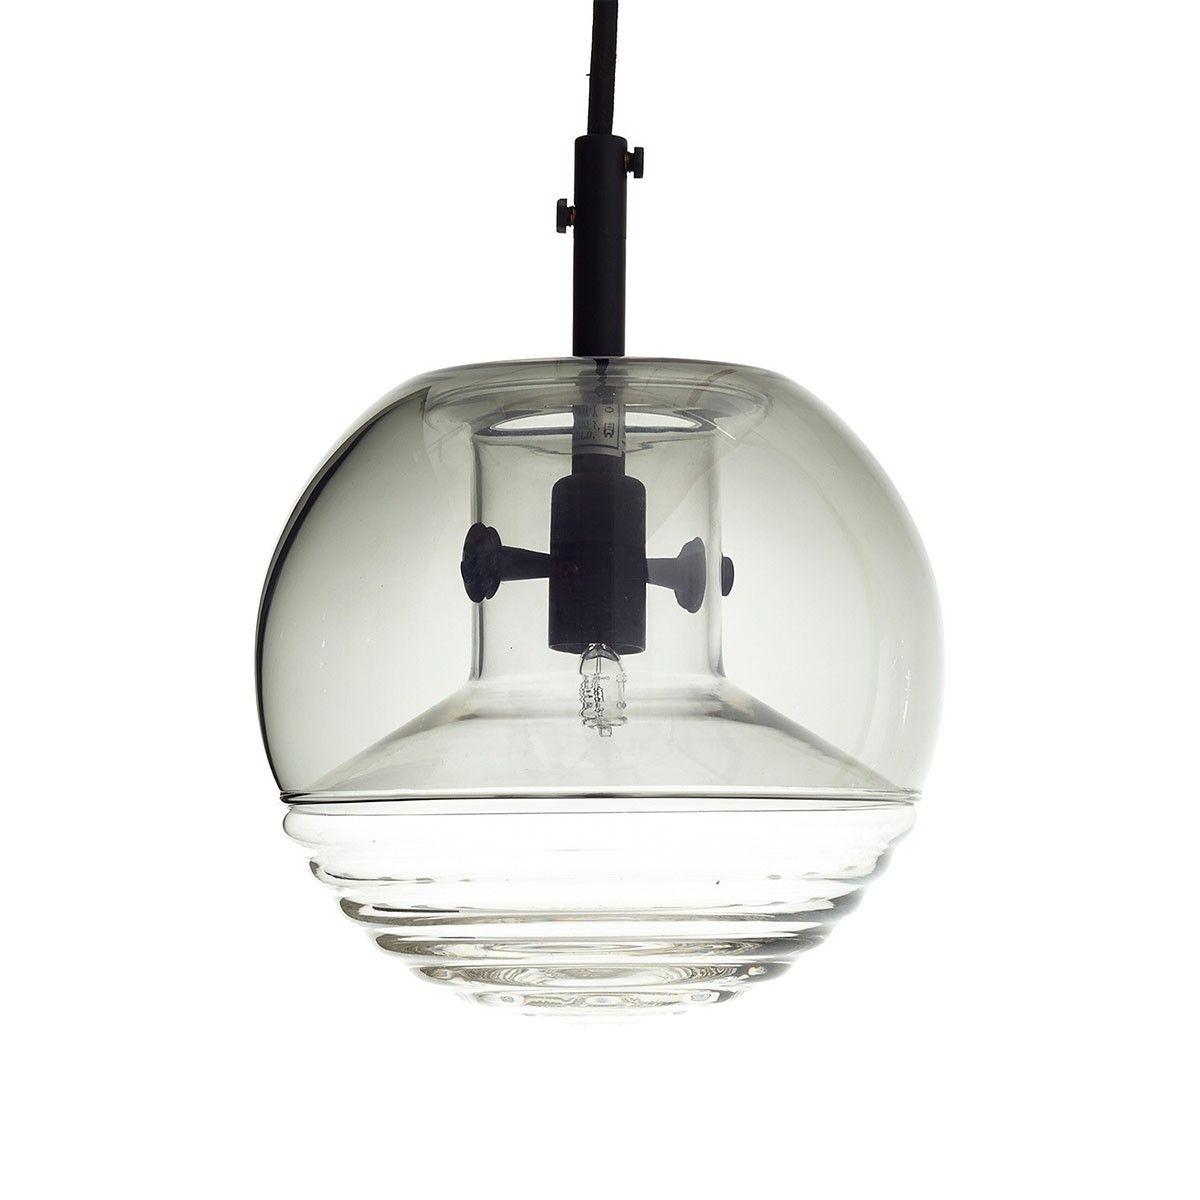 Light Warehouse Sydney: Suspension Flask - Tom Dixon